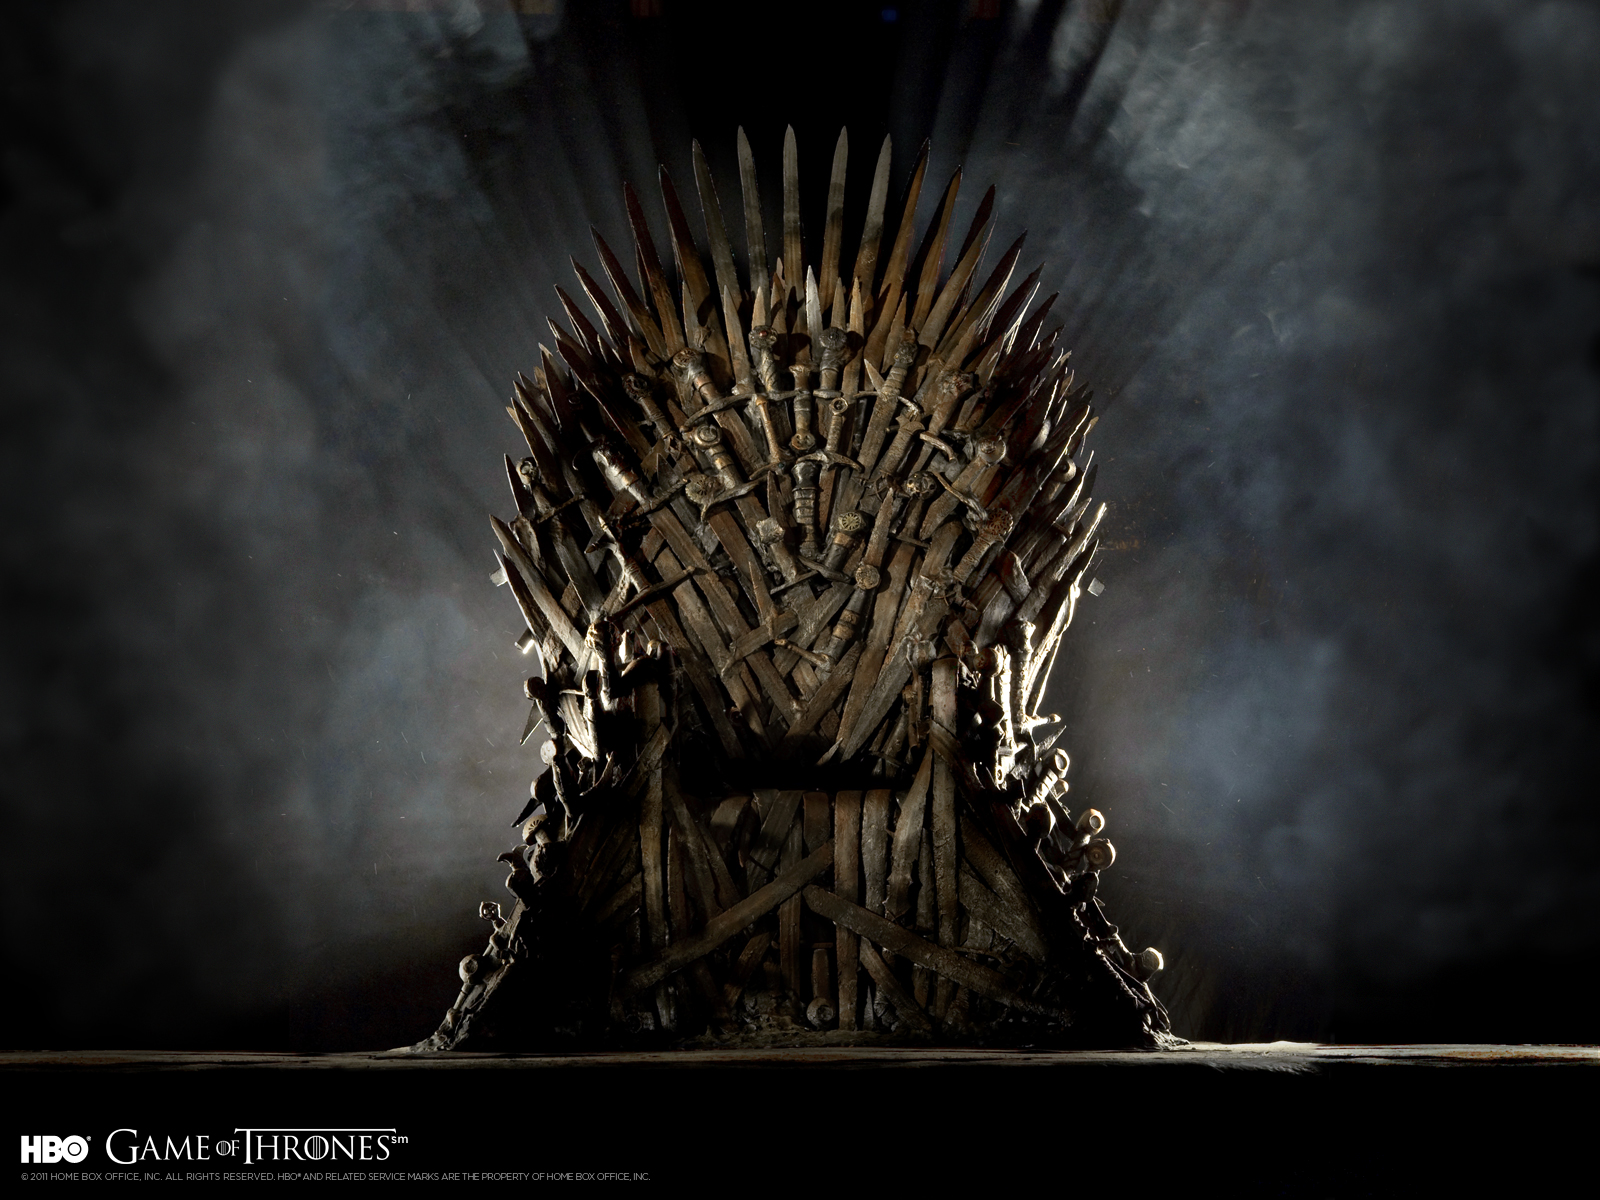 Iron Throne Wallpaper 1600x1200